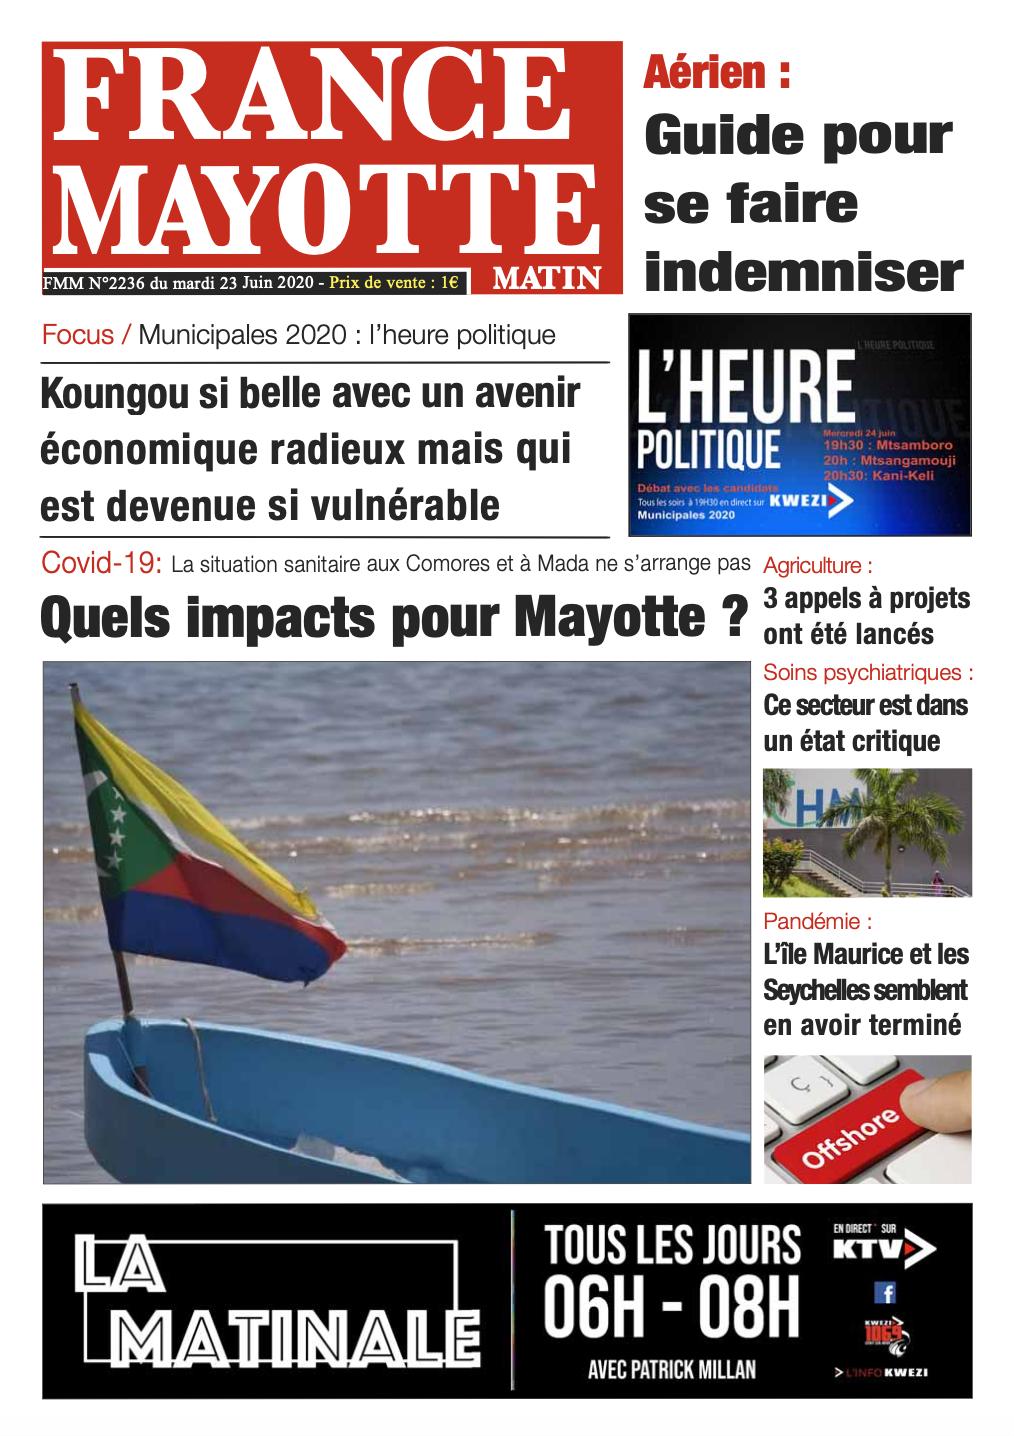 France Mayotte Mercredi 24 juin 2020